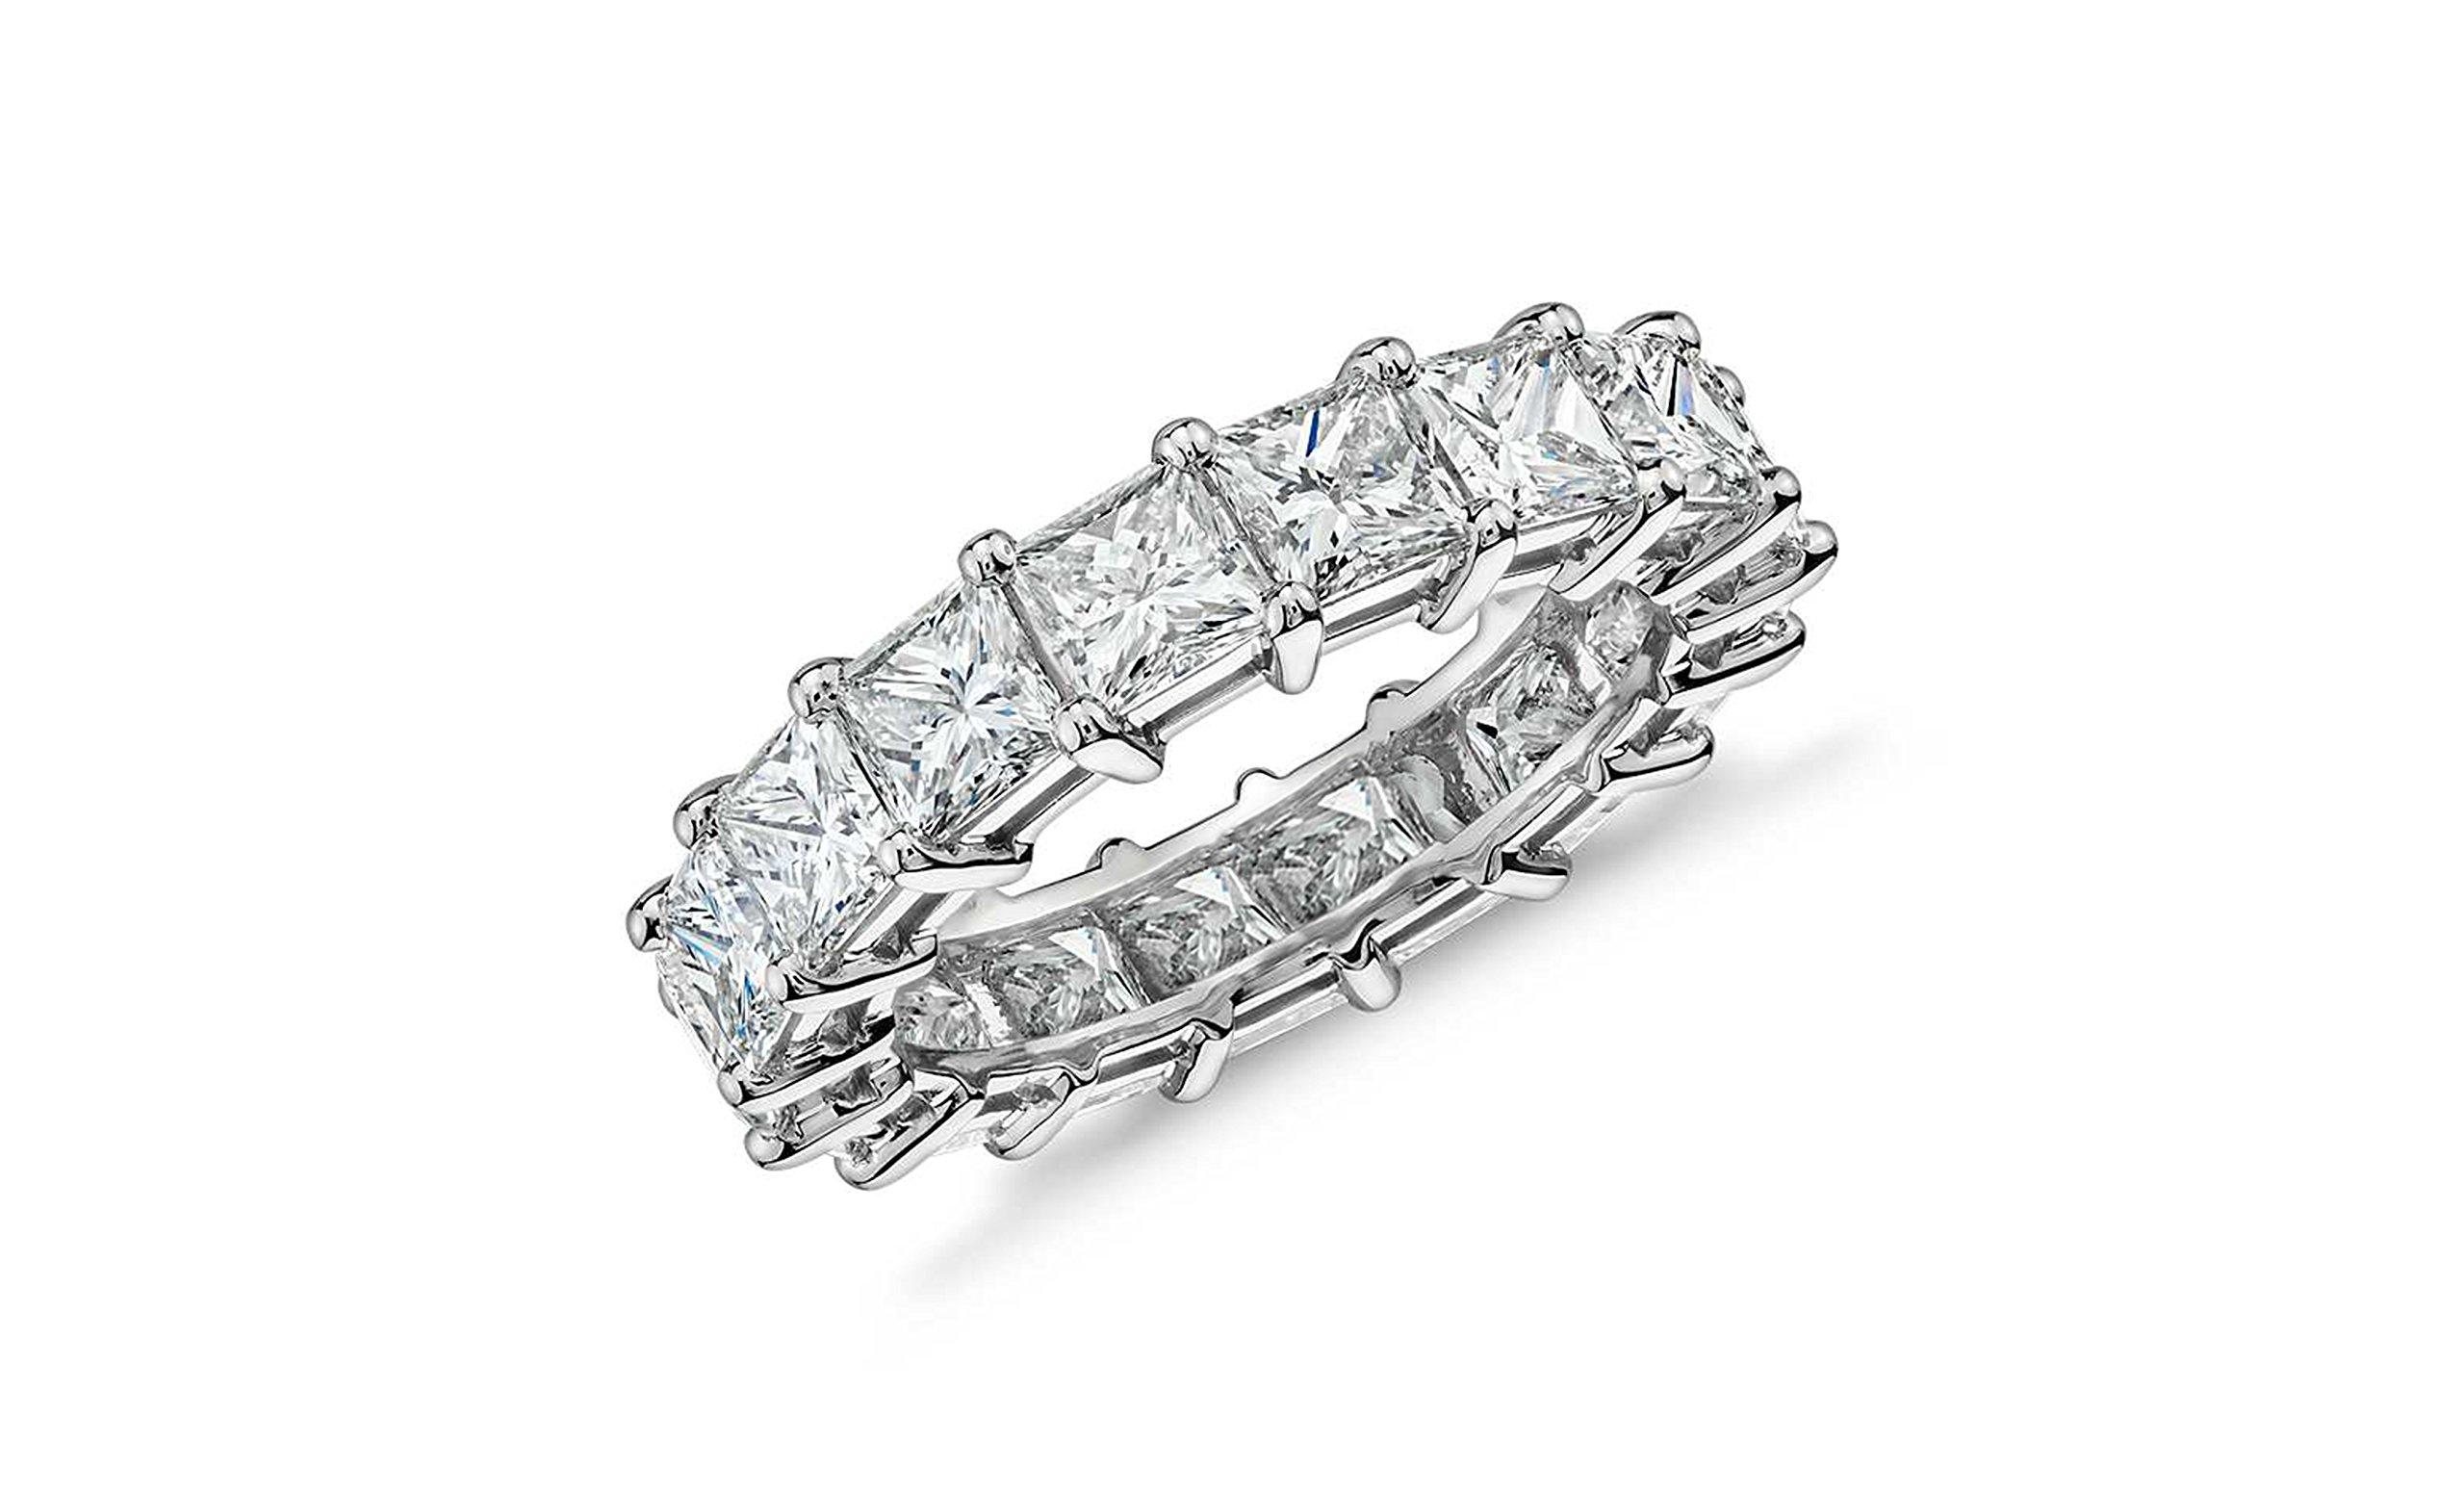 Women 4MM Princess Cut Eternity Wedding Engagement Band, Sizes 5-9 (9)